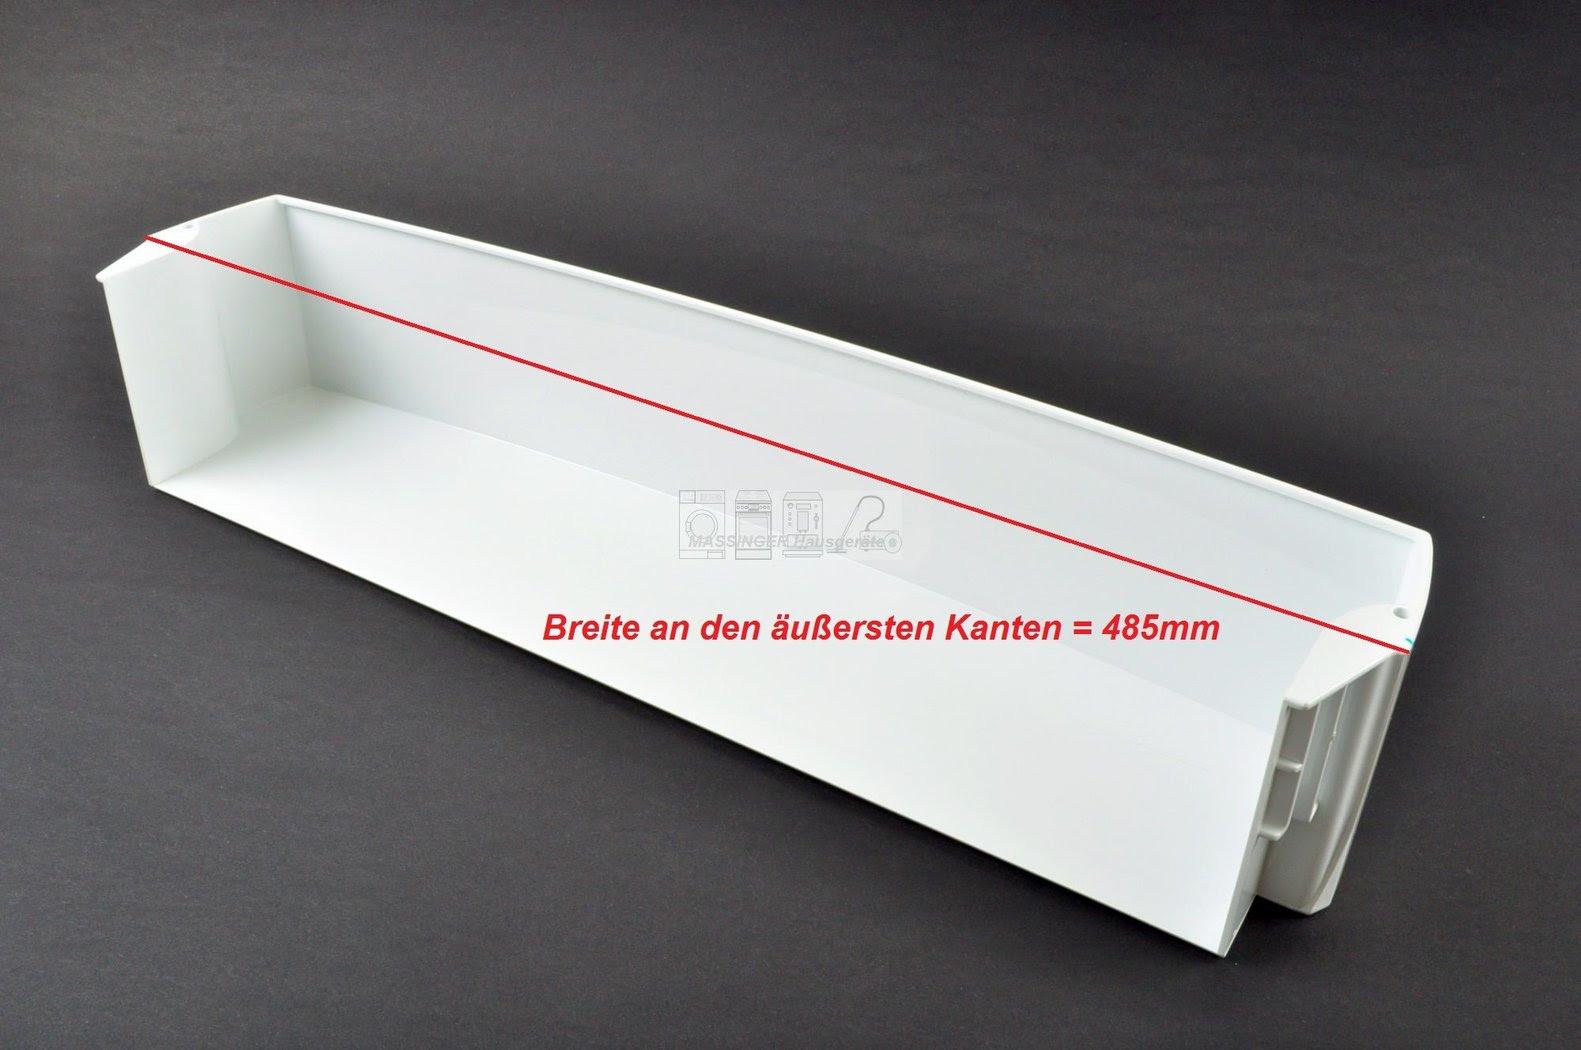 Gorenje Kühlschrank Ersatzteile : Gorenje kühlschrank ersatzteile fach: gorenje kühlschrank